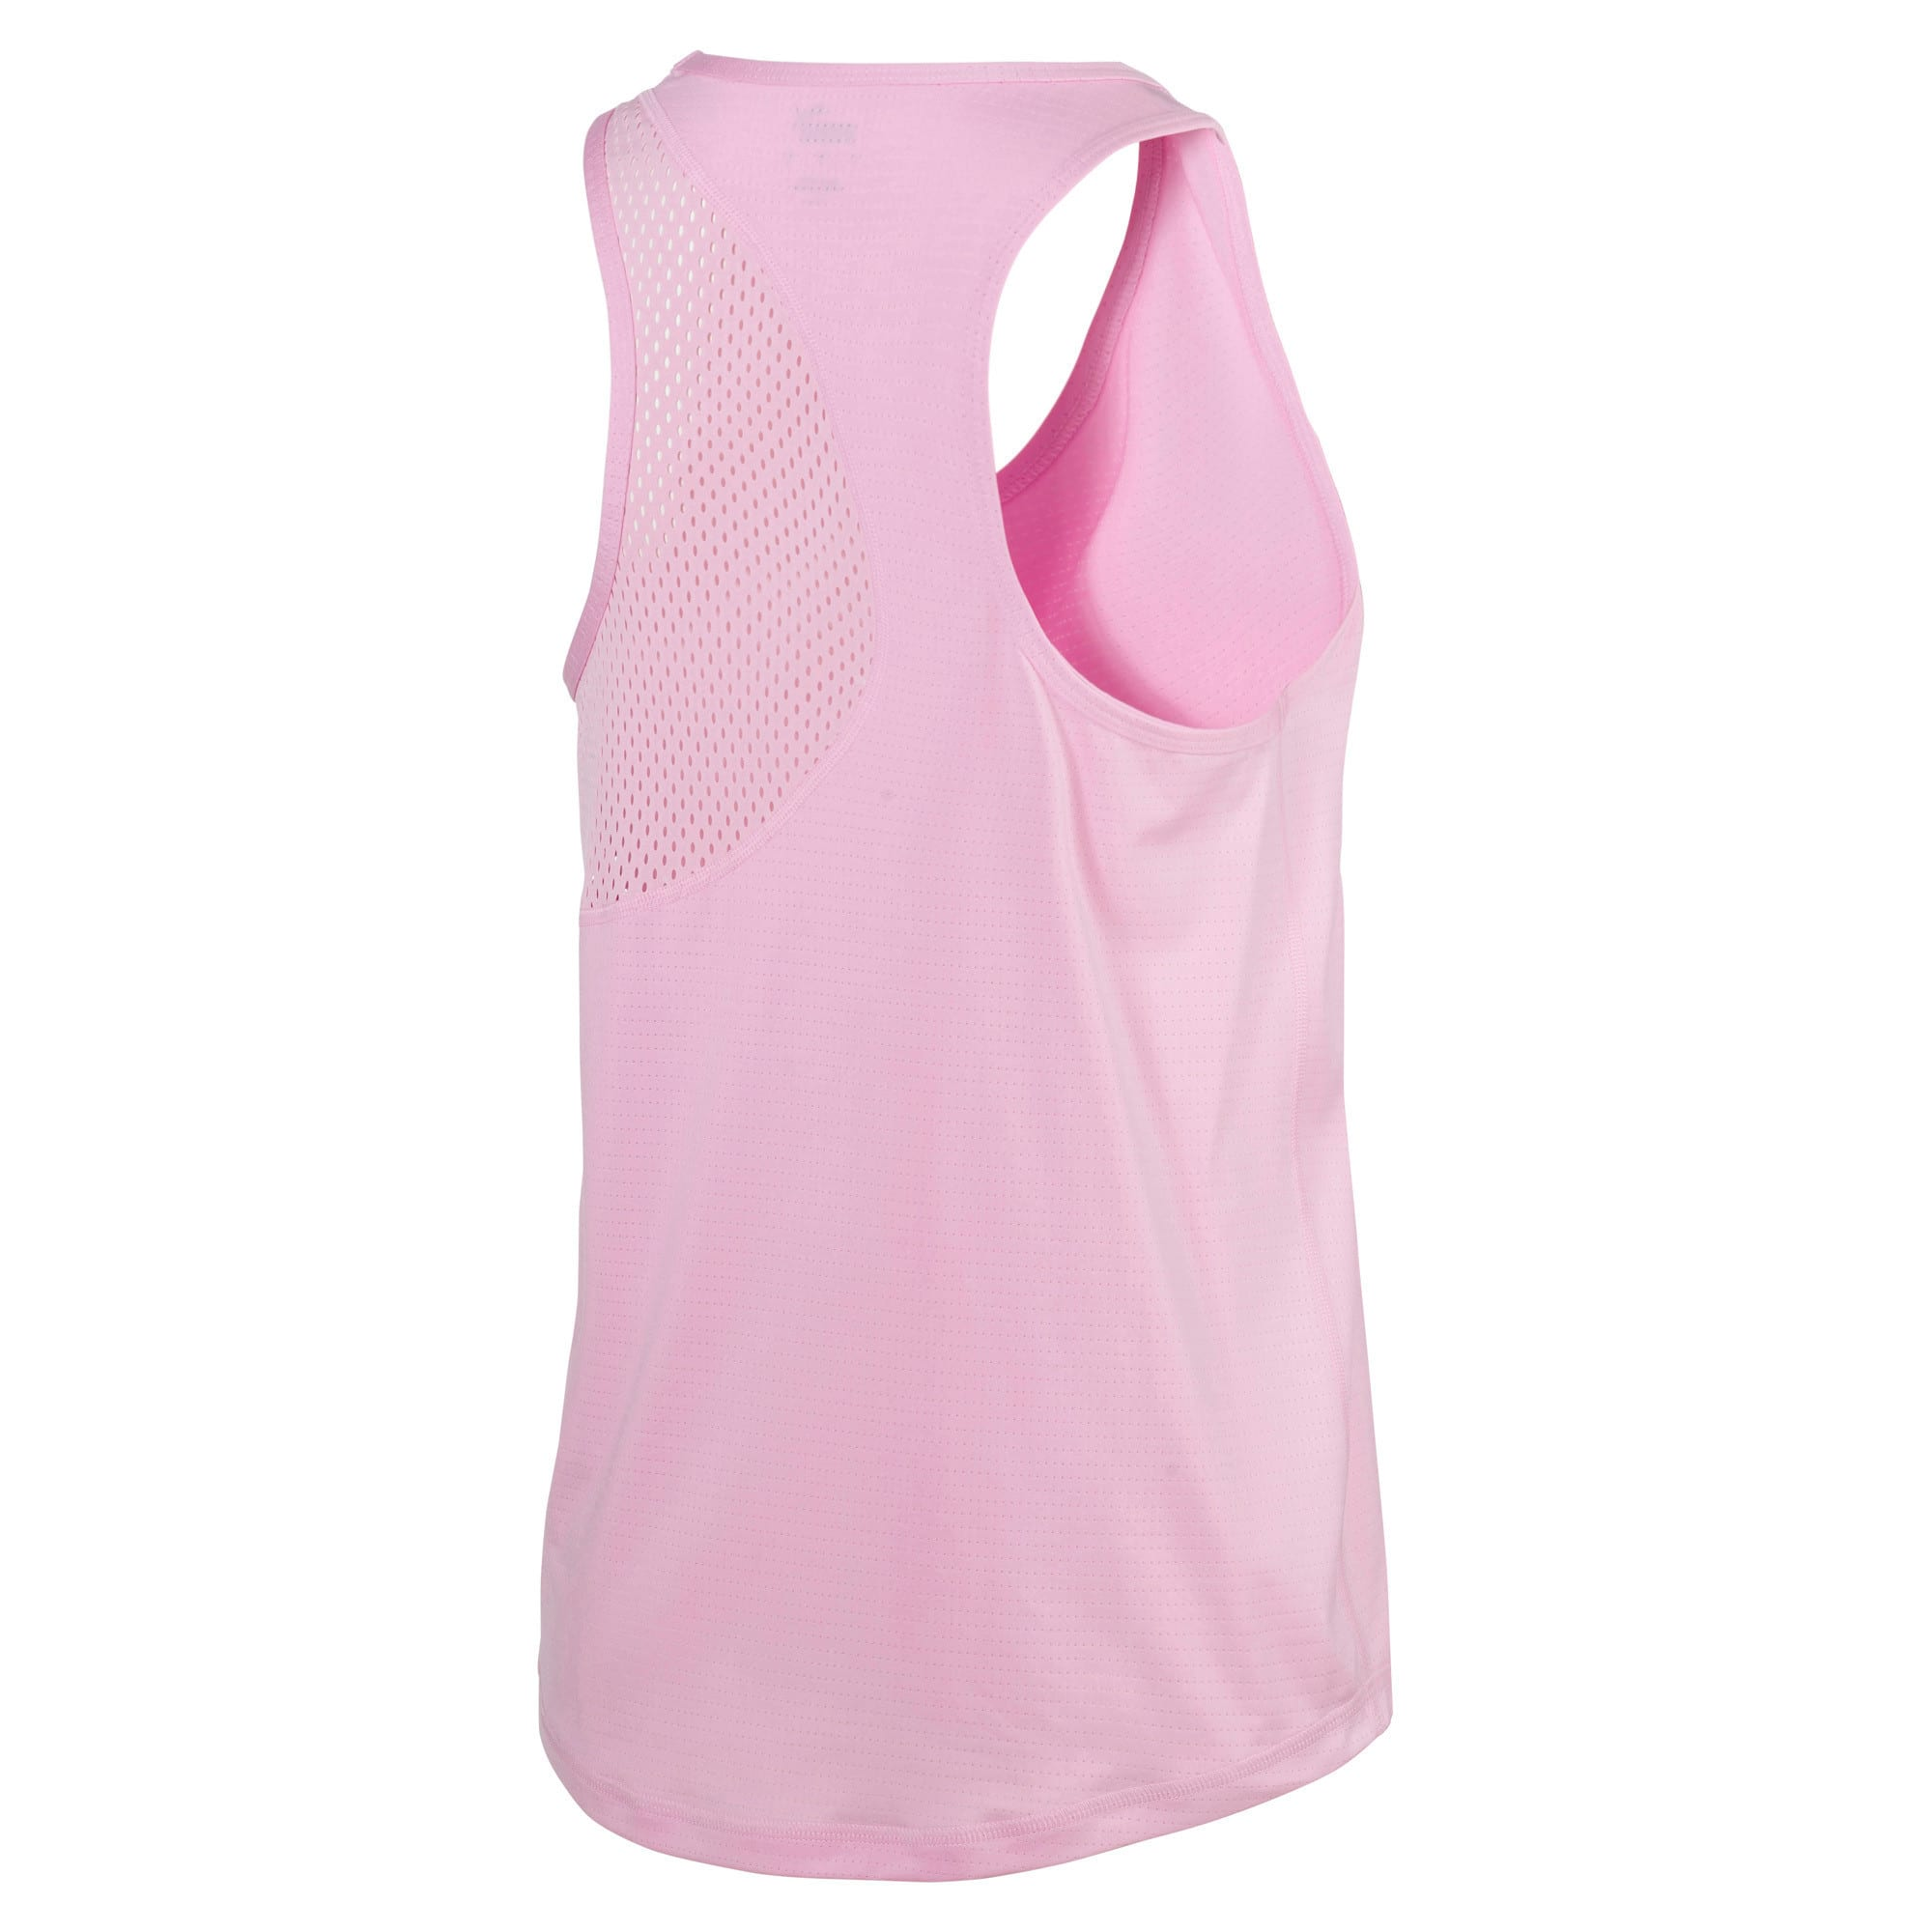 Thumbnail 5 of A.C.E. Raceback Women's Training Tank Top, Pale Pink, medium-IND